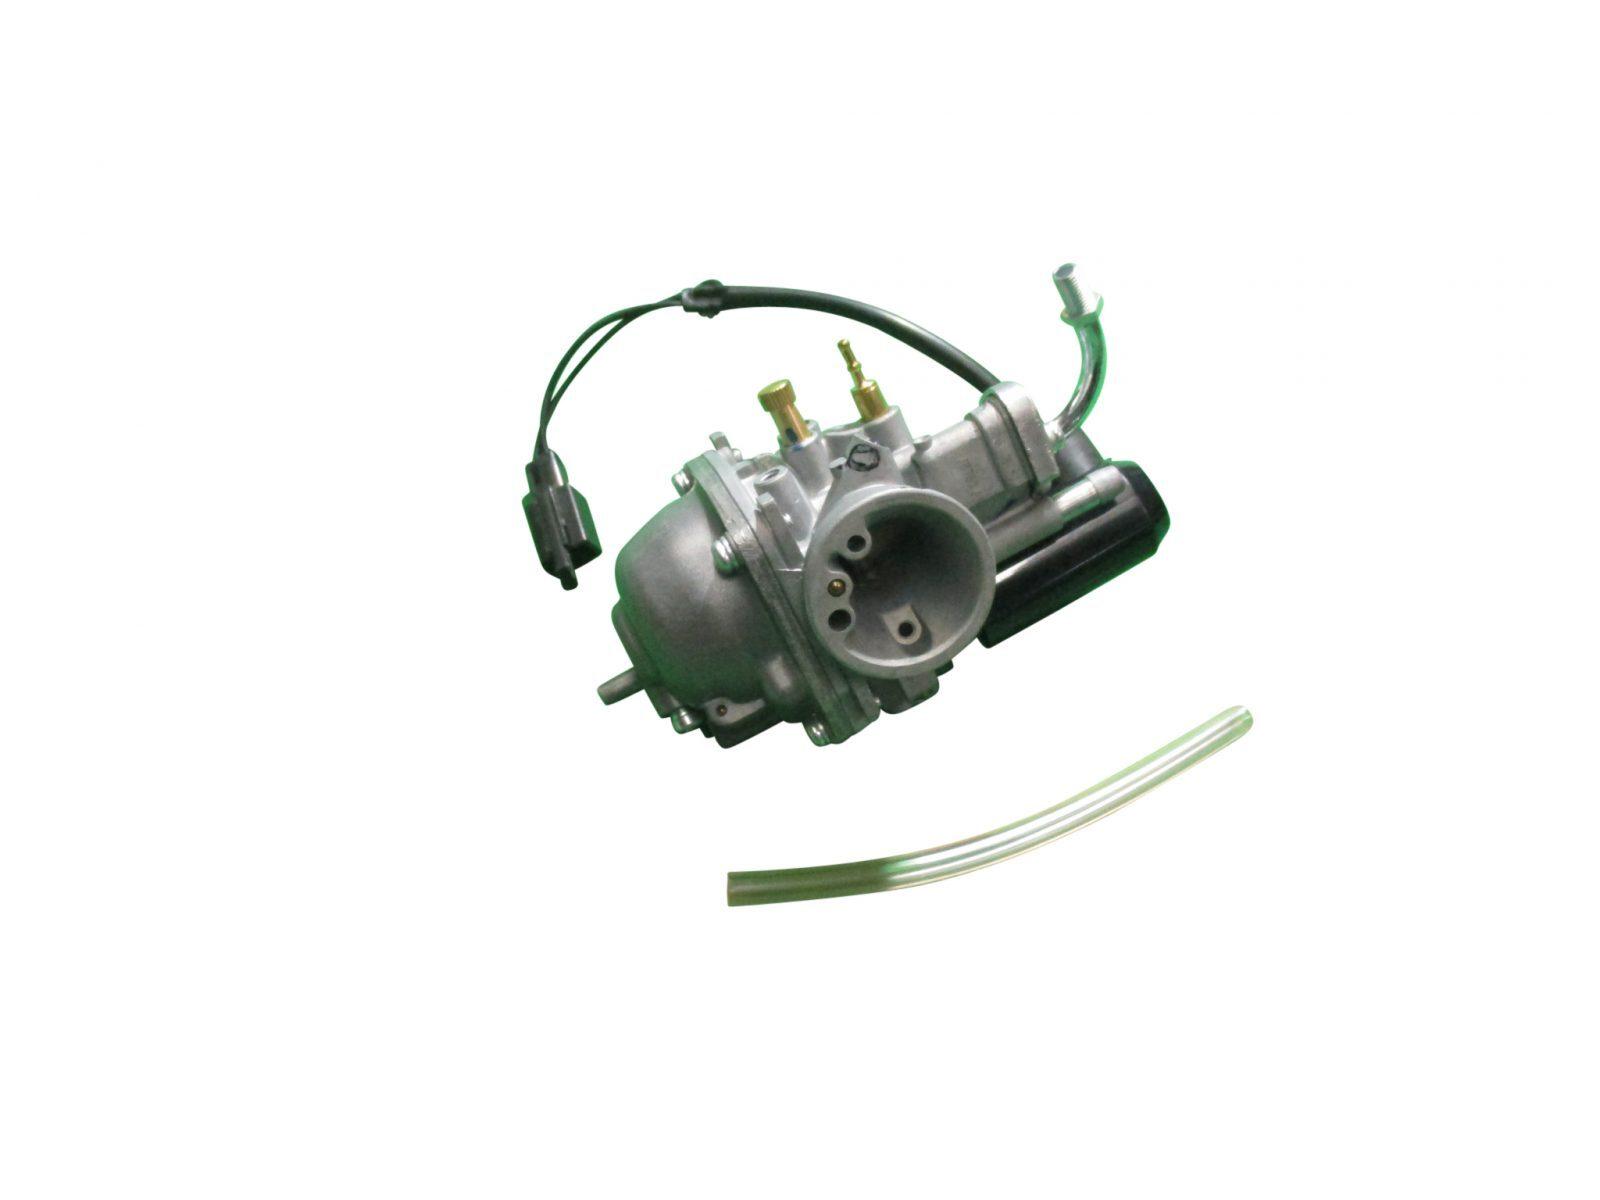 49cc Carburetor Assembly 16100-116-0aj